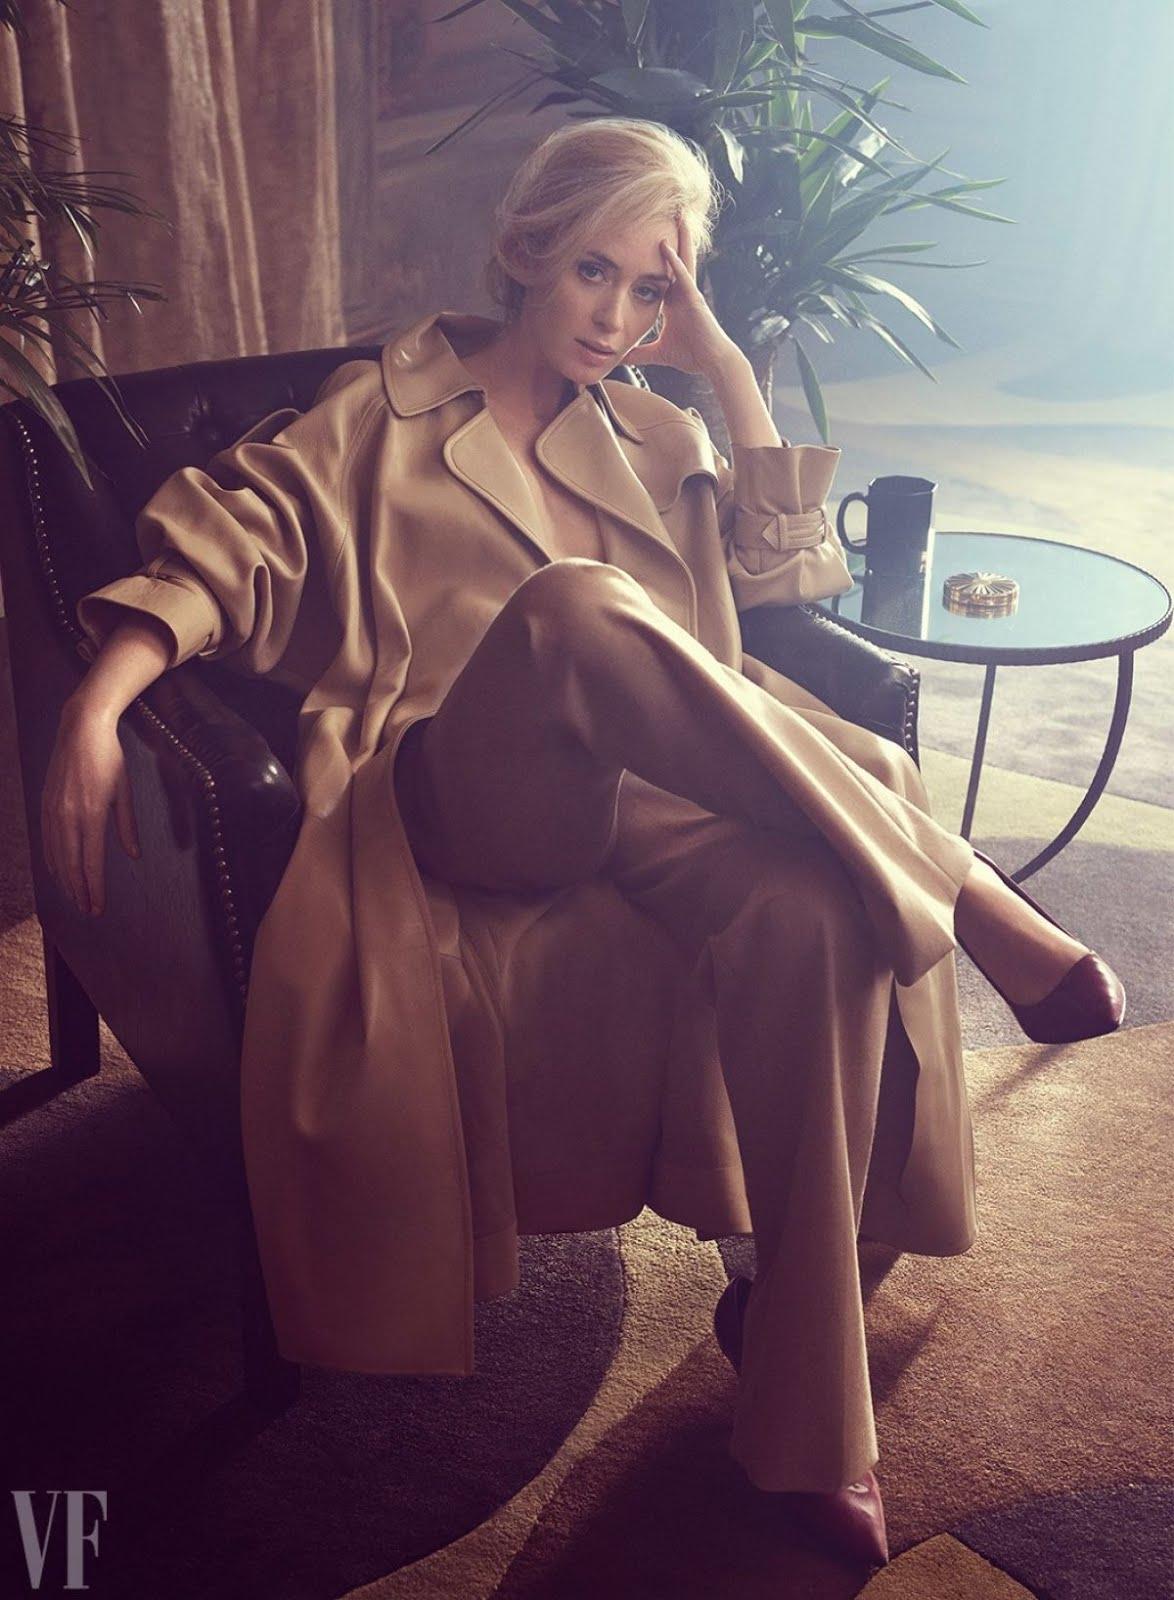 HQ Photo Shoot of Emily Blunt for Vanity Fair Magazine February 2018